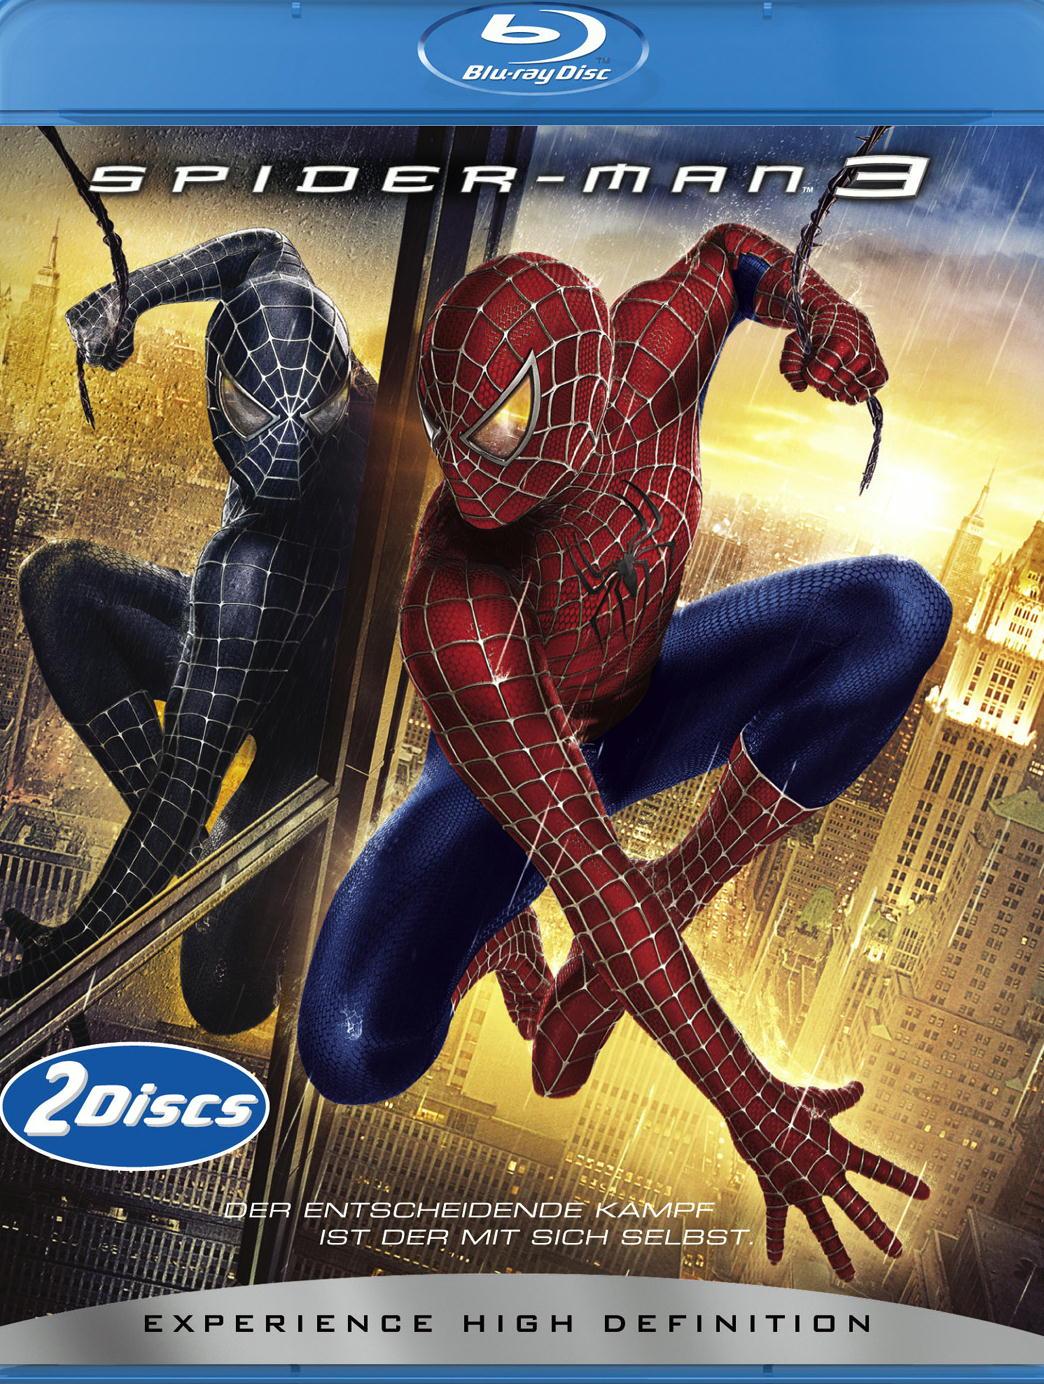 Spider-Man 3 (2 Discs) Poster